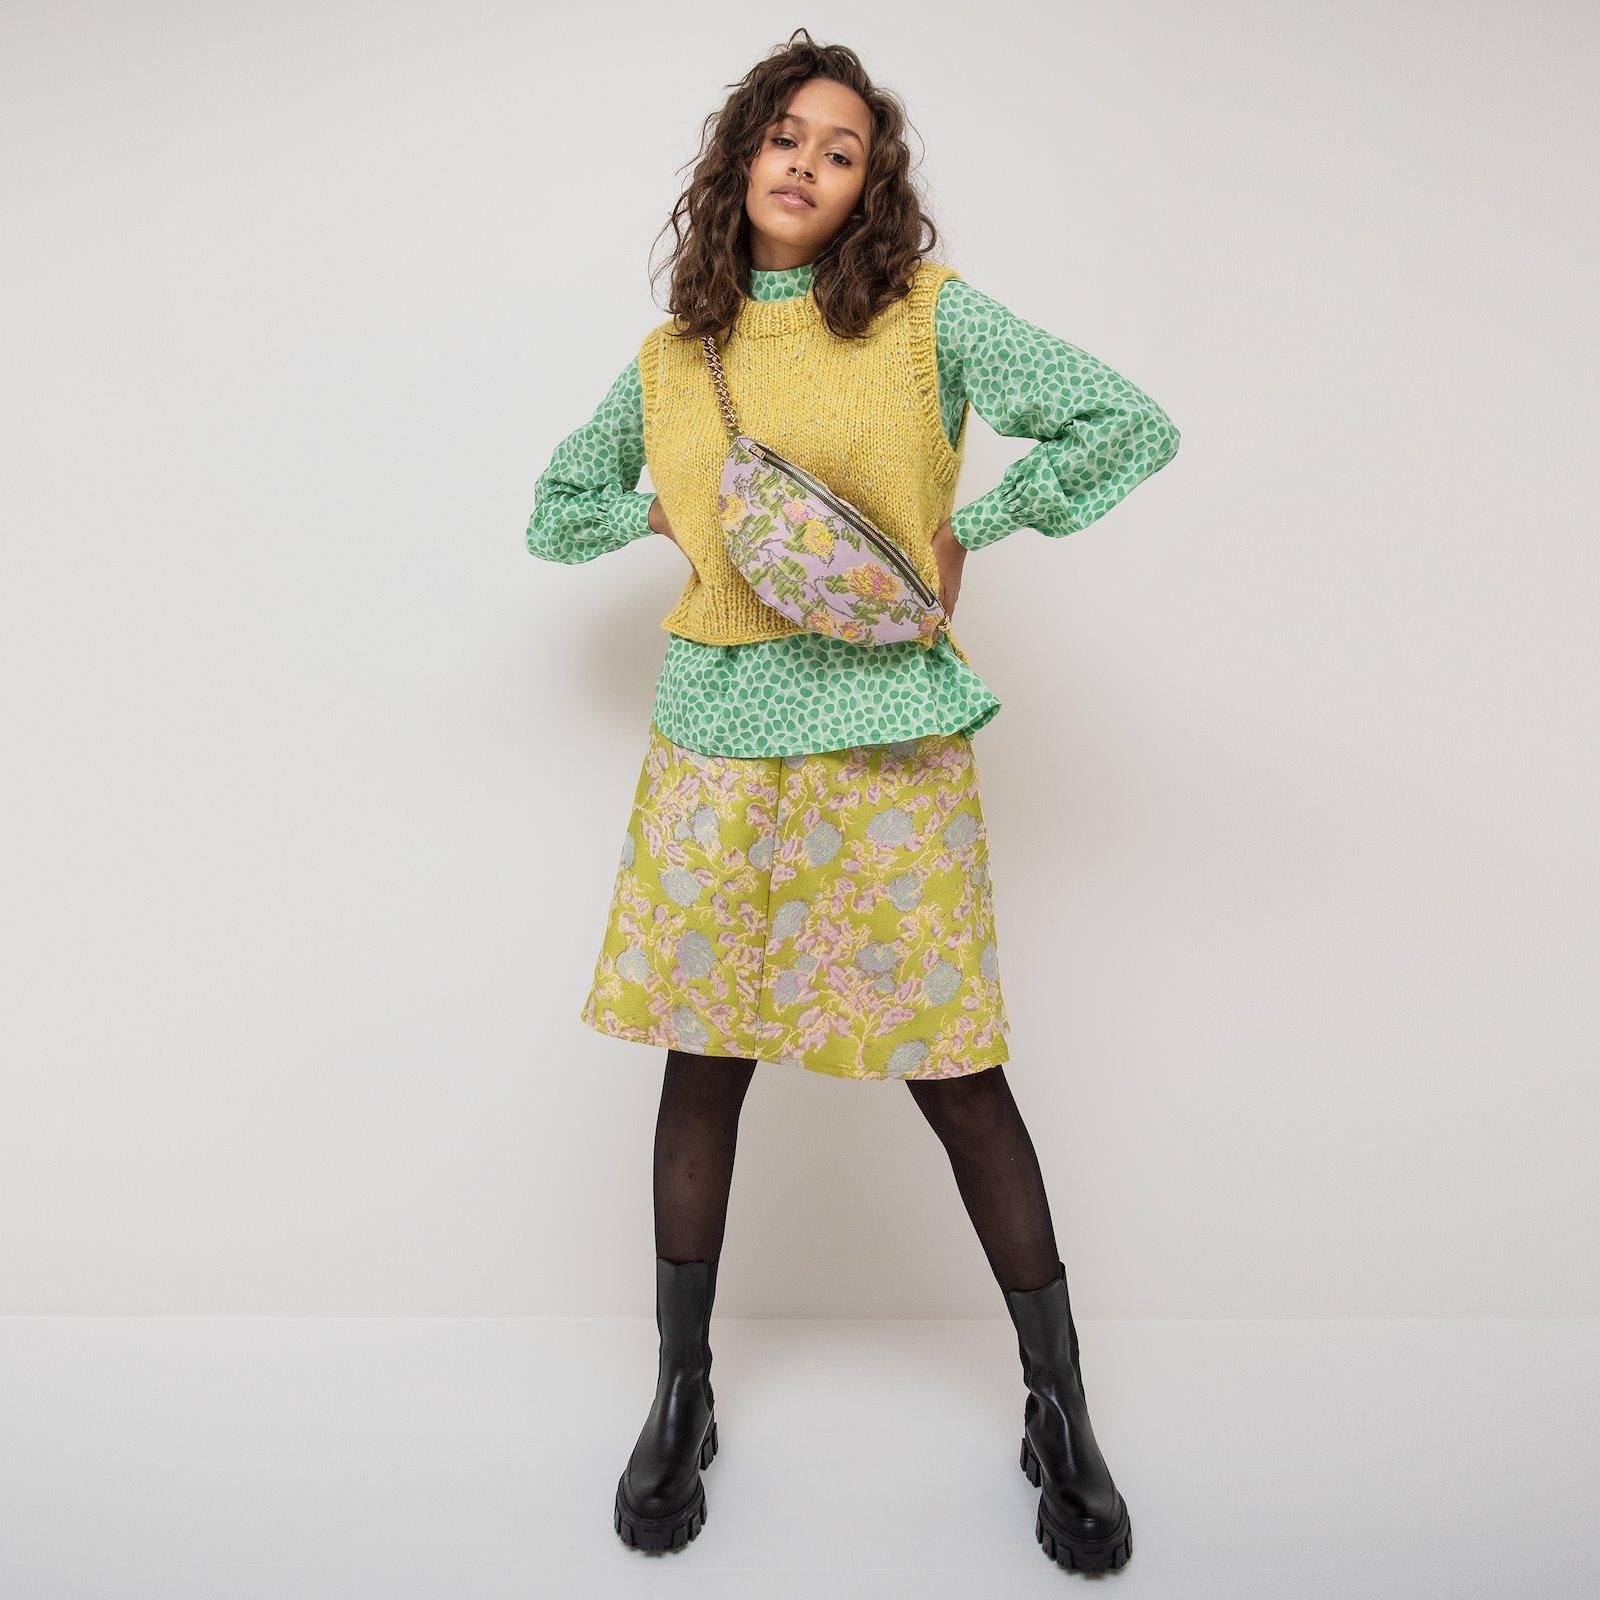 Skirt with A-shape, 38/10 p23163_580066_33215_FRAYA2030_90000001_p21038_400325_p90307_400325_9901_4351_z59333_38101_sskit